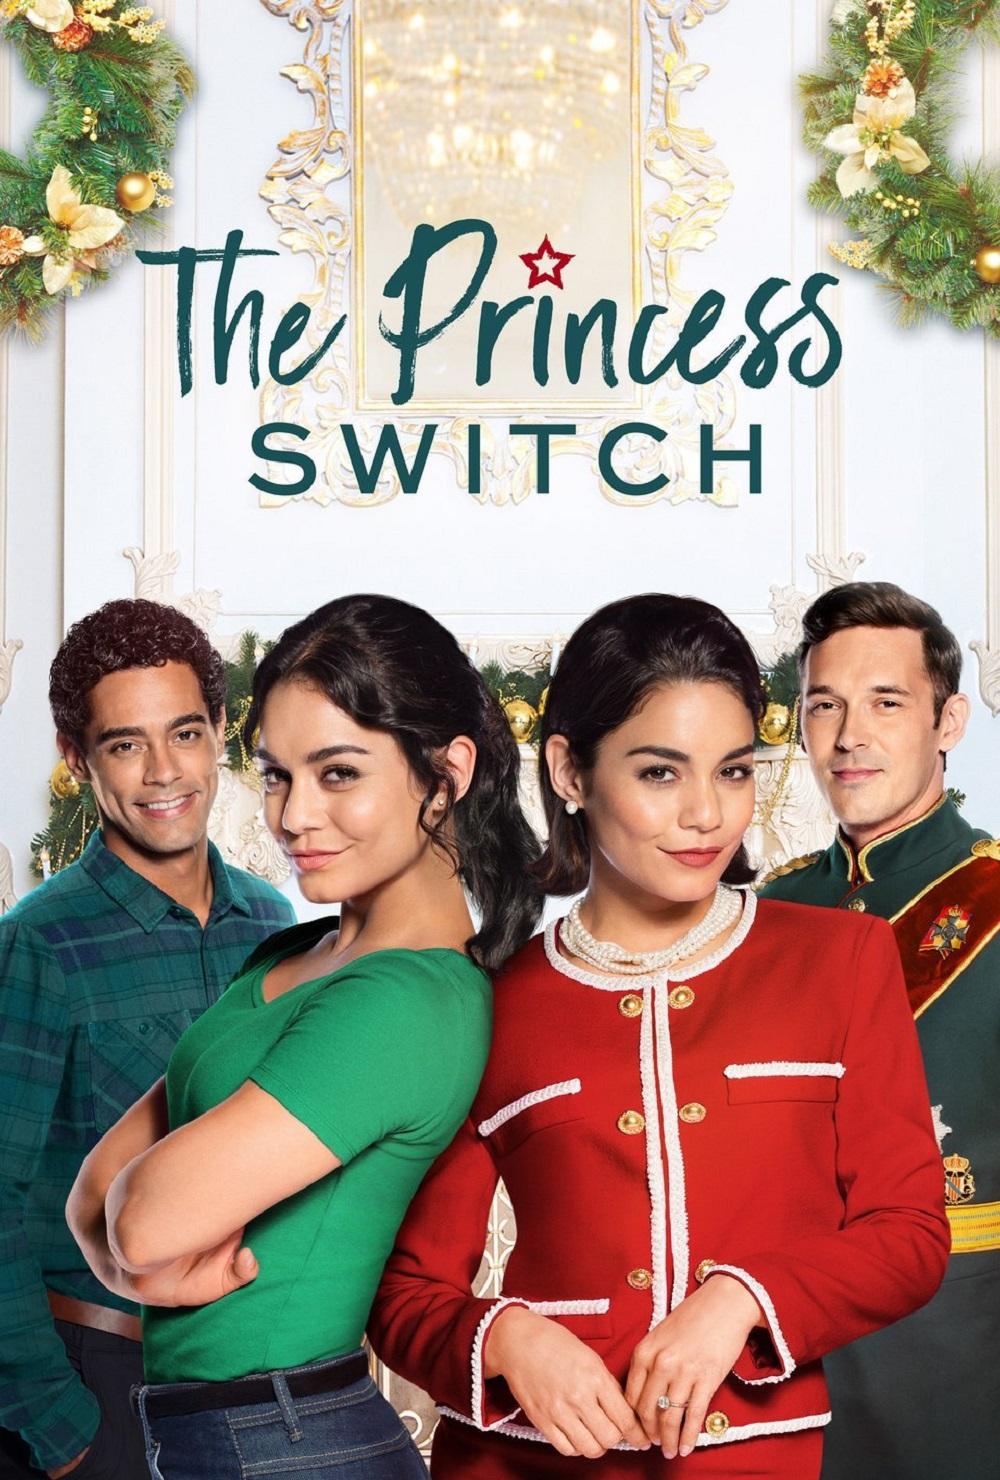 7. The Princess Switch (2018)  故事講述以爲女公爵在聖誕前一周與平民女生交換了身份,在聖誕老人的幫助底下,公爵喜歡了平民的同事,而平民則愛上了公爵的未婚夫...